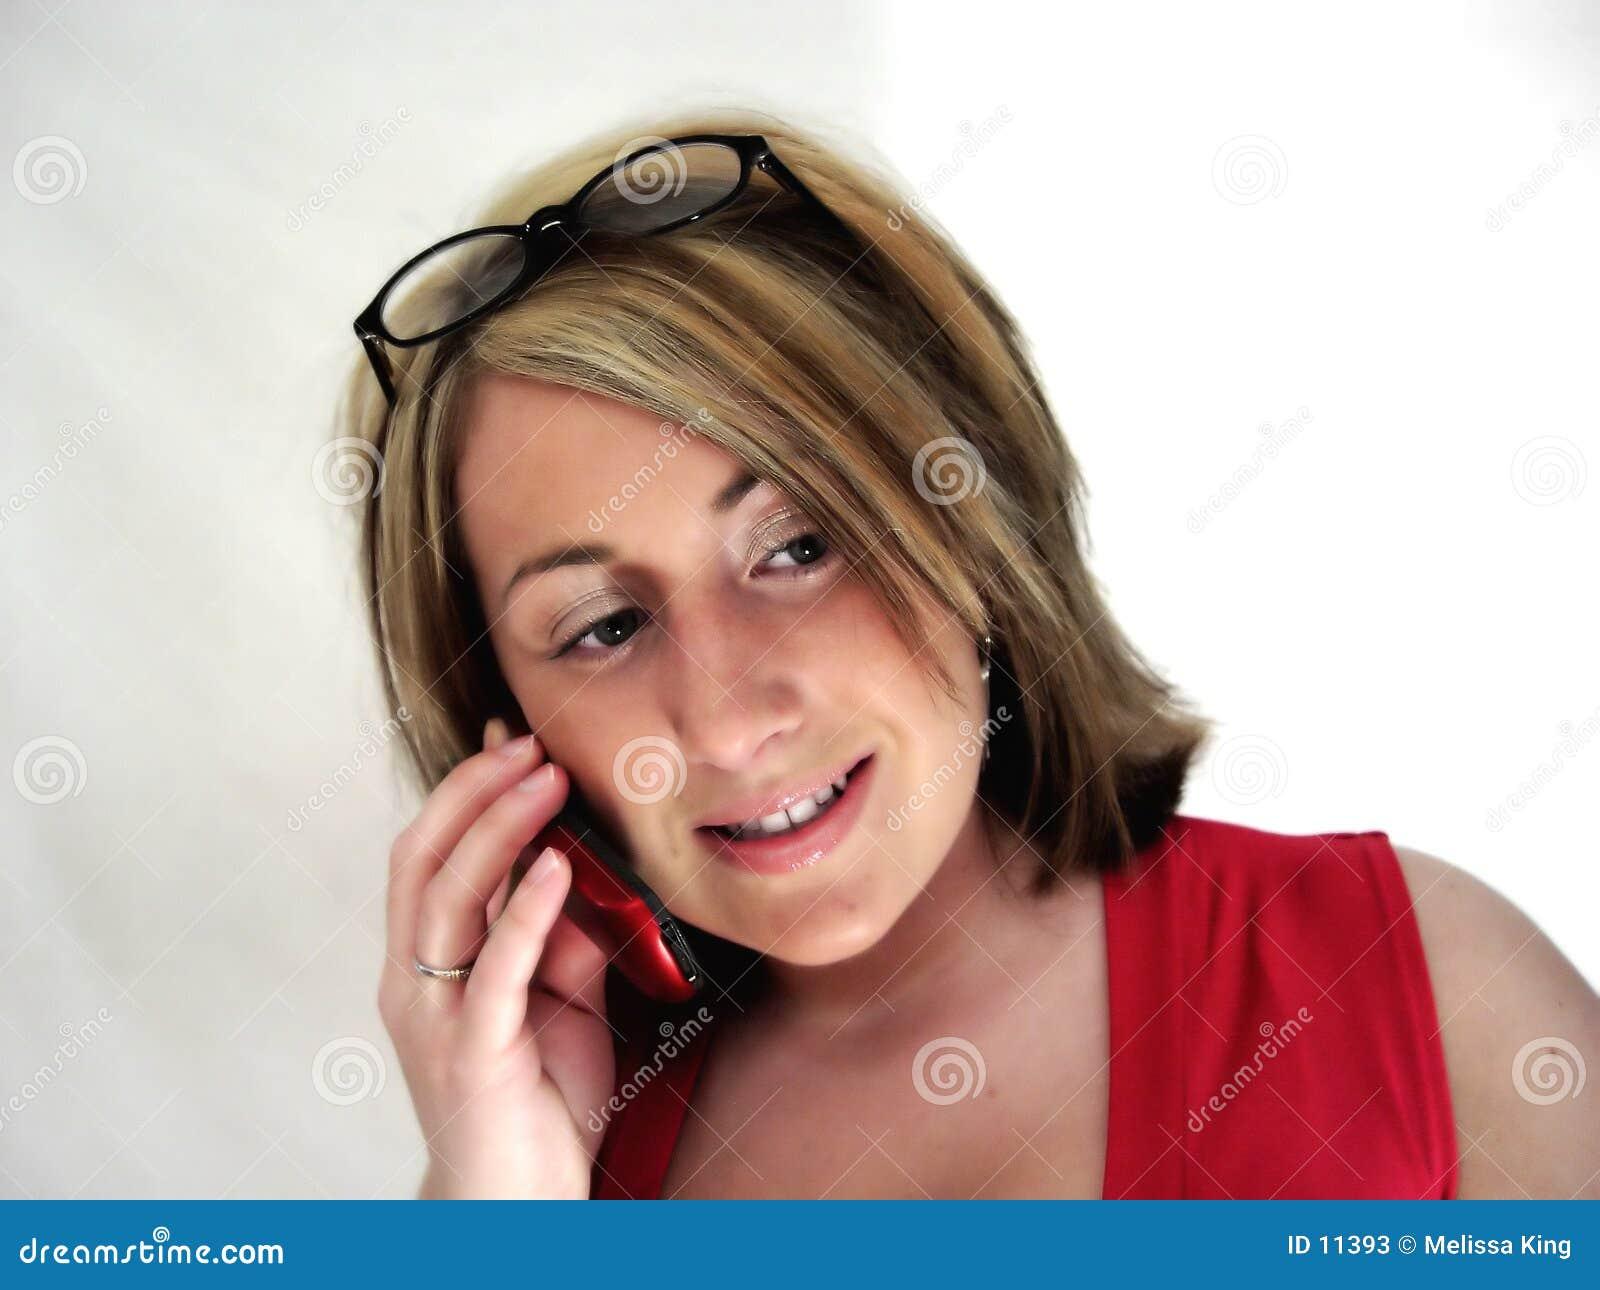 Business Lady On Phone III